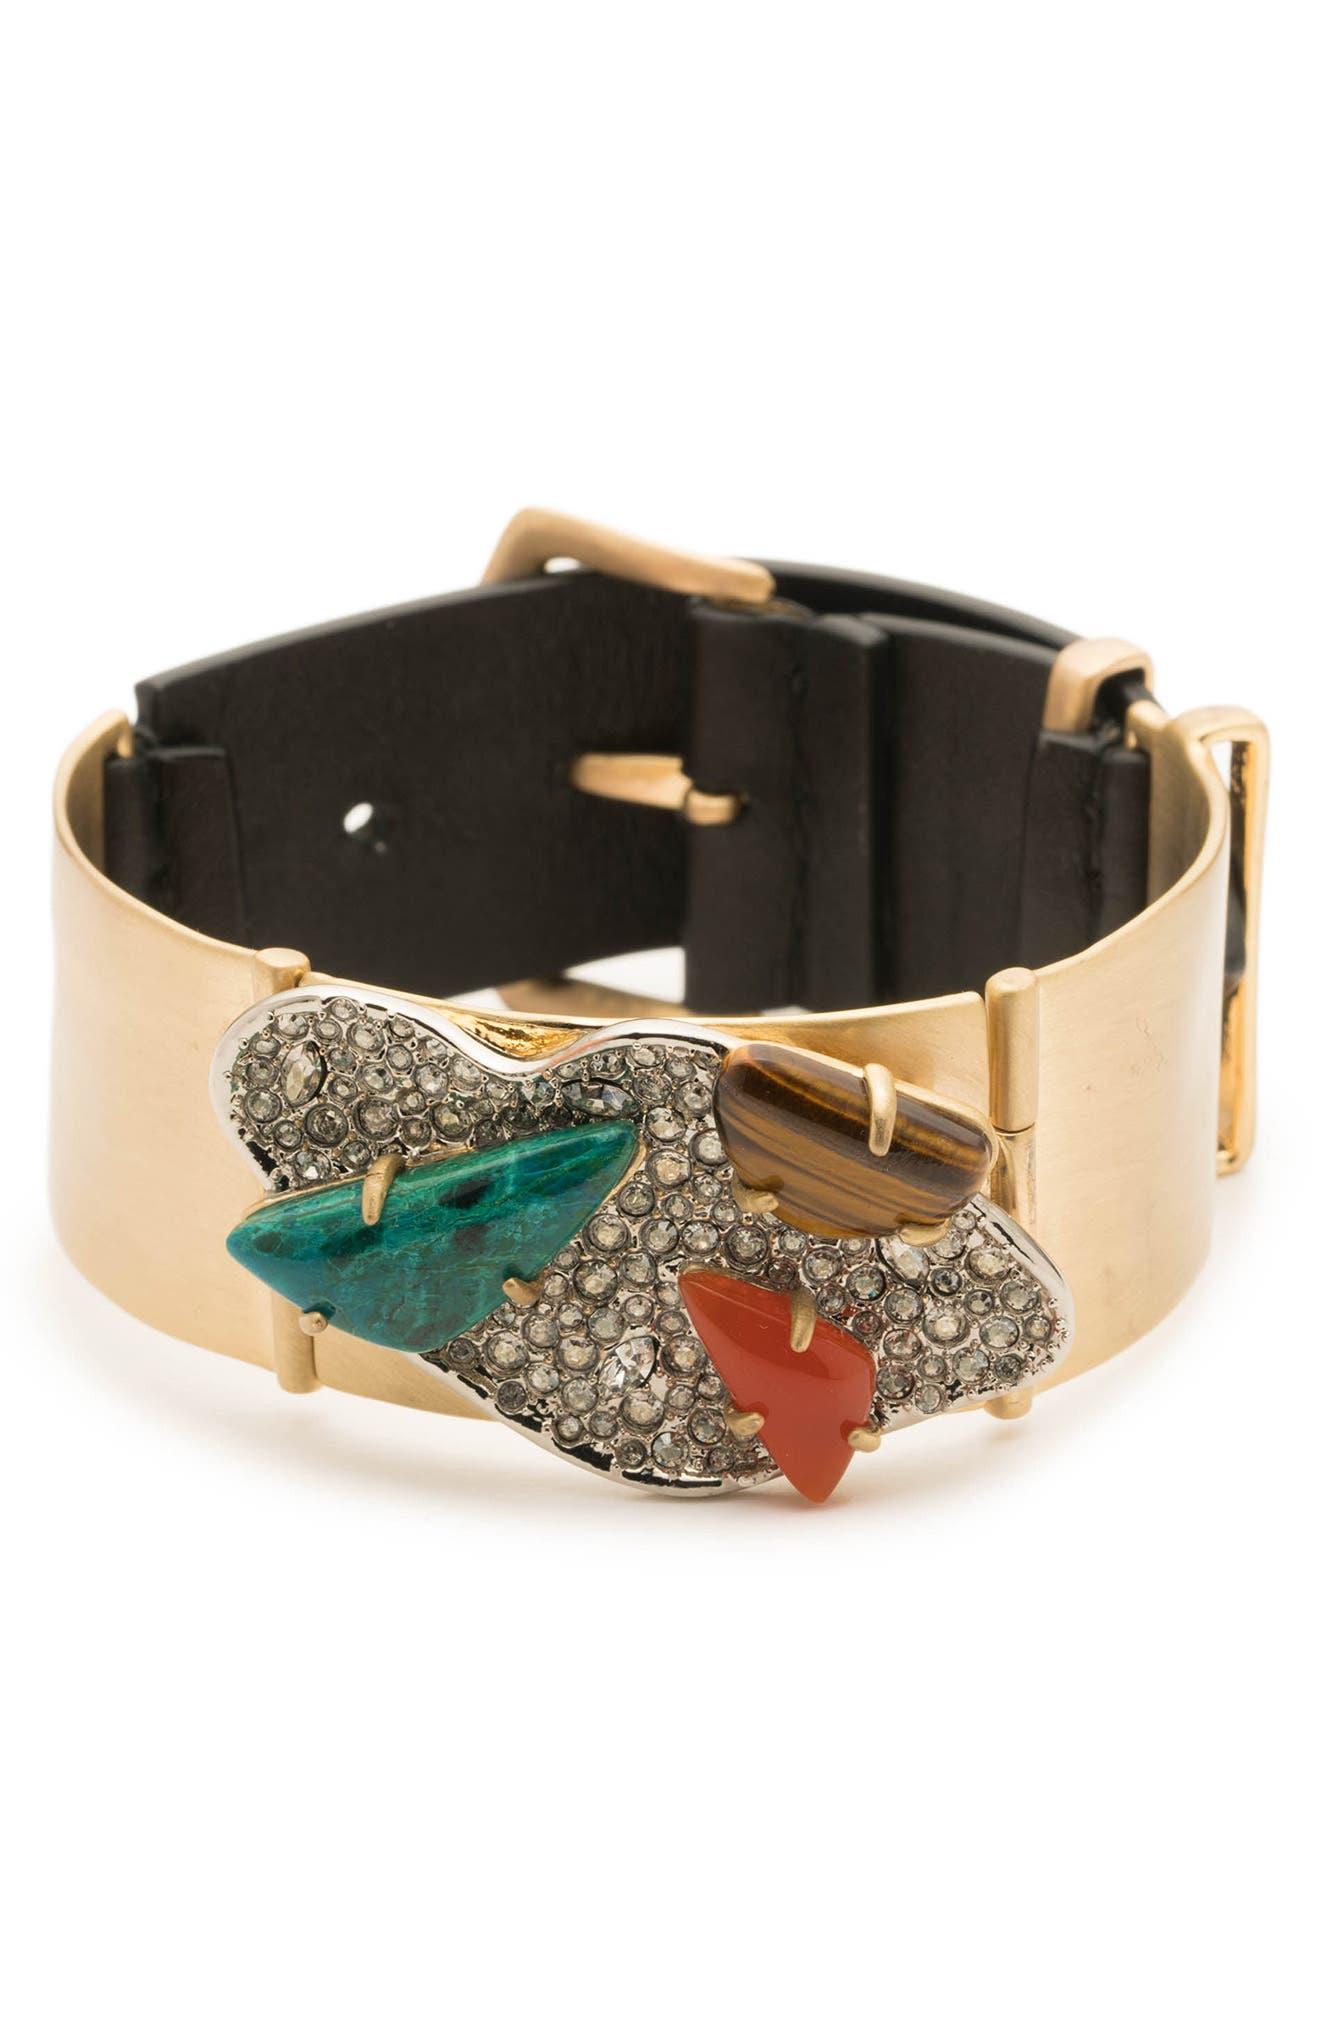 Crystal Encrusted Leather Strap Bracelet,                         Main,                         color, GOLD/ SILVER